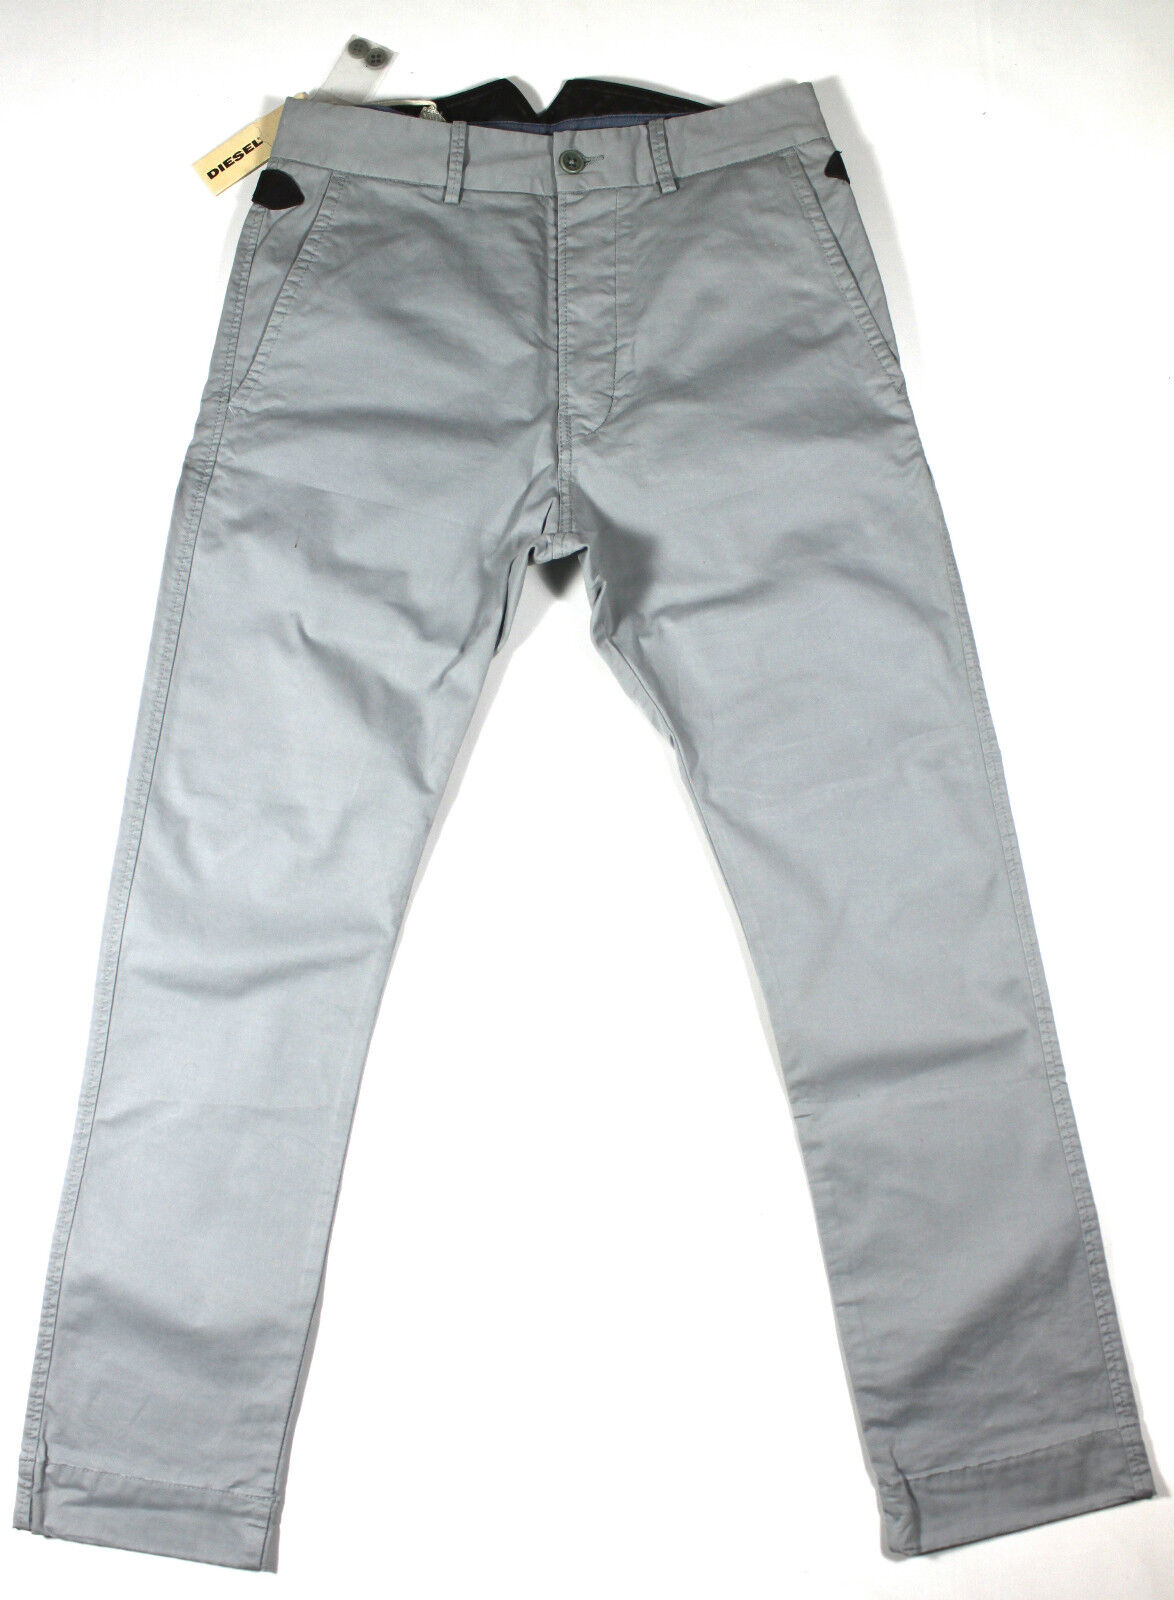 BRAND NEW DIESEL KUGAN 00GPW 94G PANTS 28X32 CARred FIT STRAIGHT LEG RRP